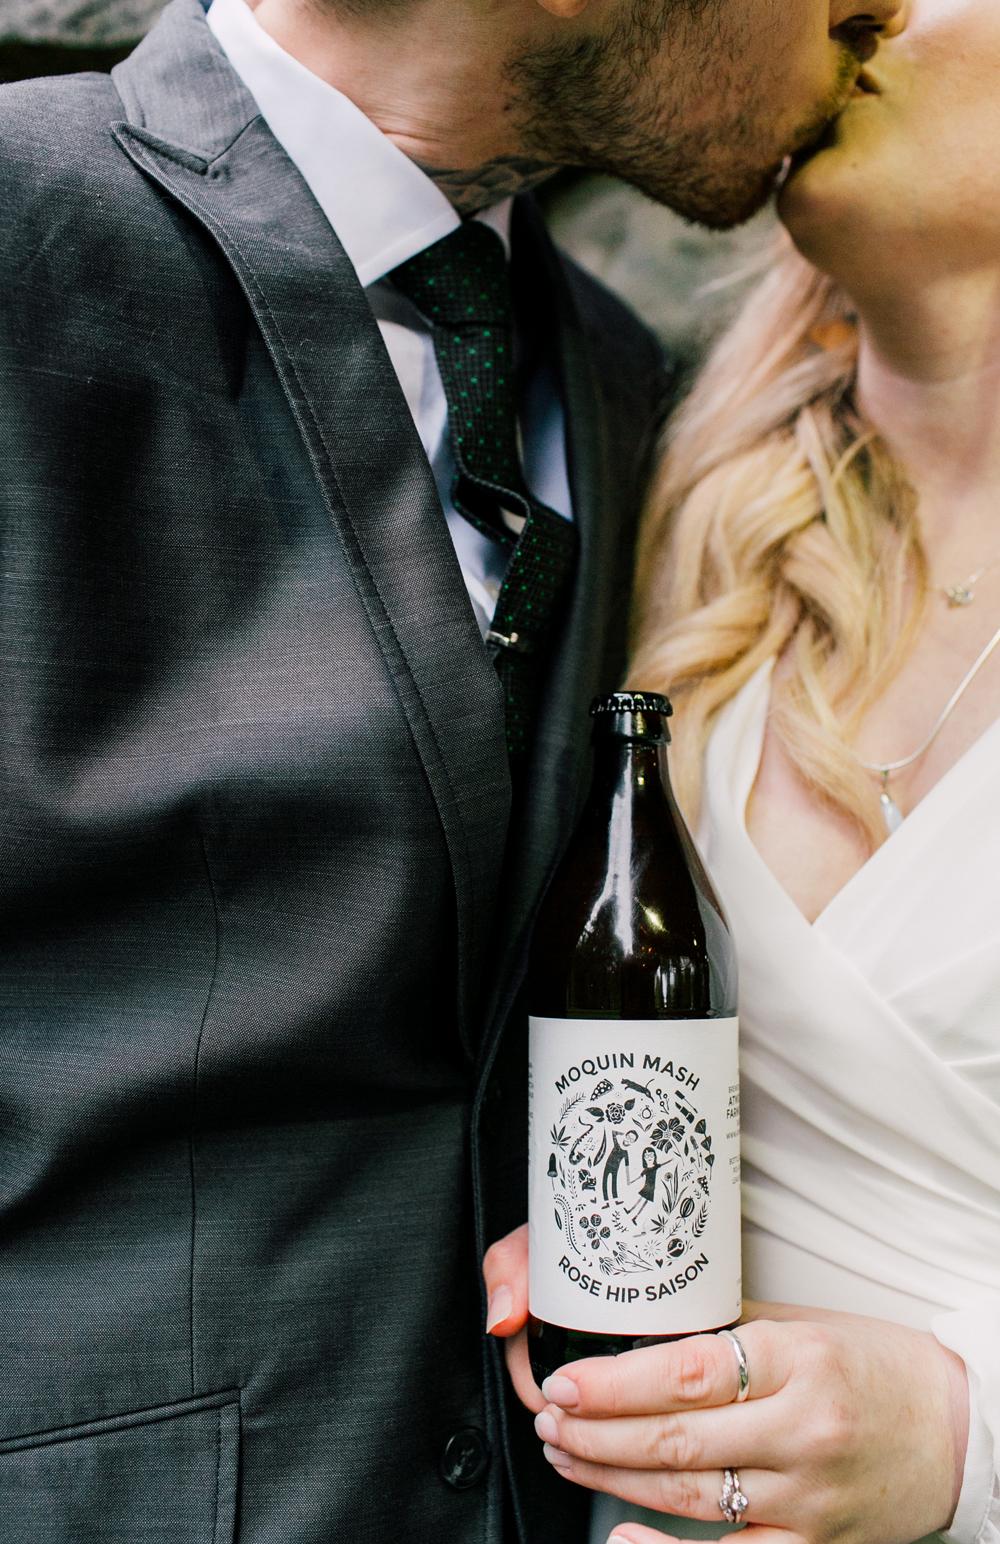 021-bellingham-wedding-photographer-hovander-park-ferndale-katheryn-moran-bre-mitch.jpg